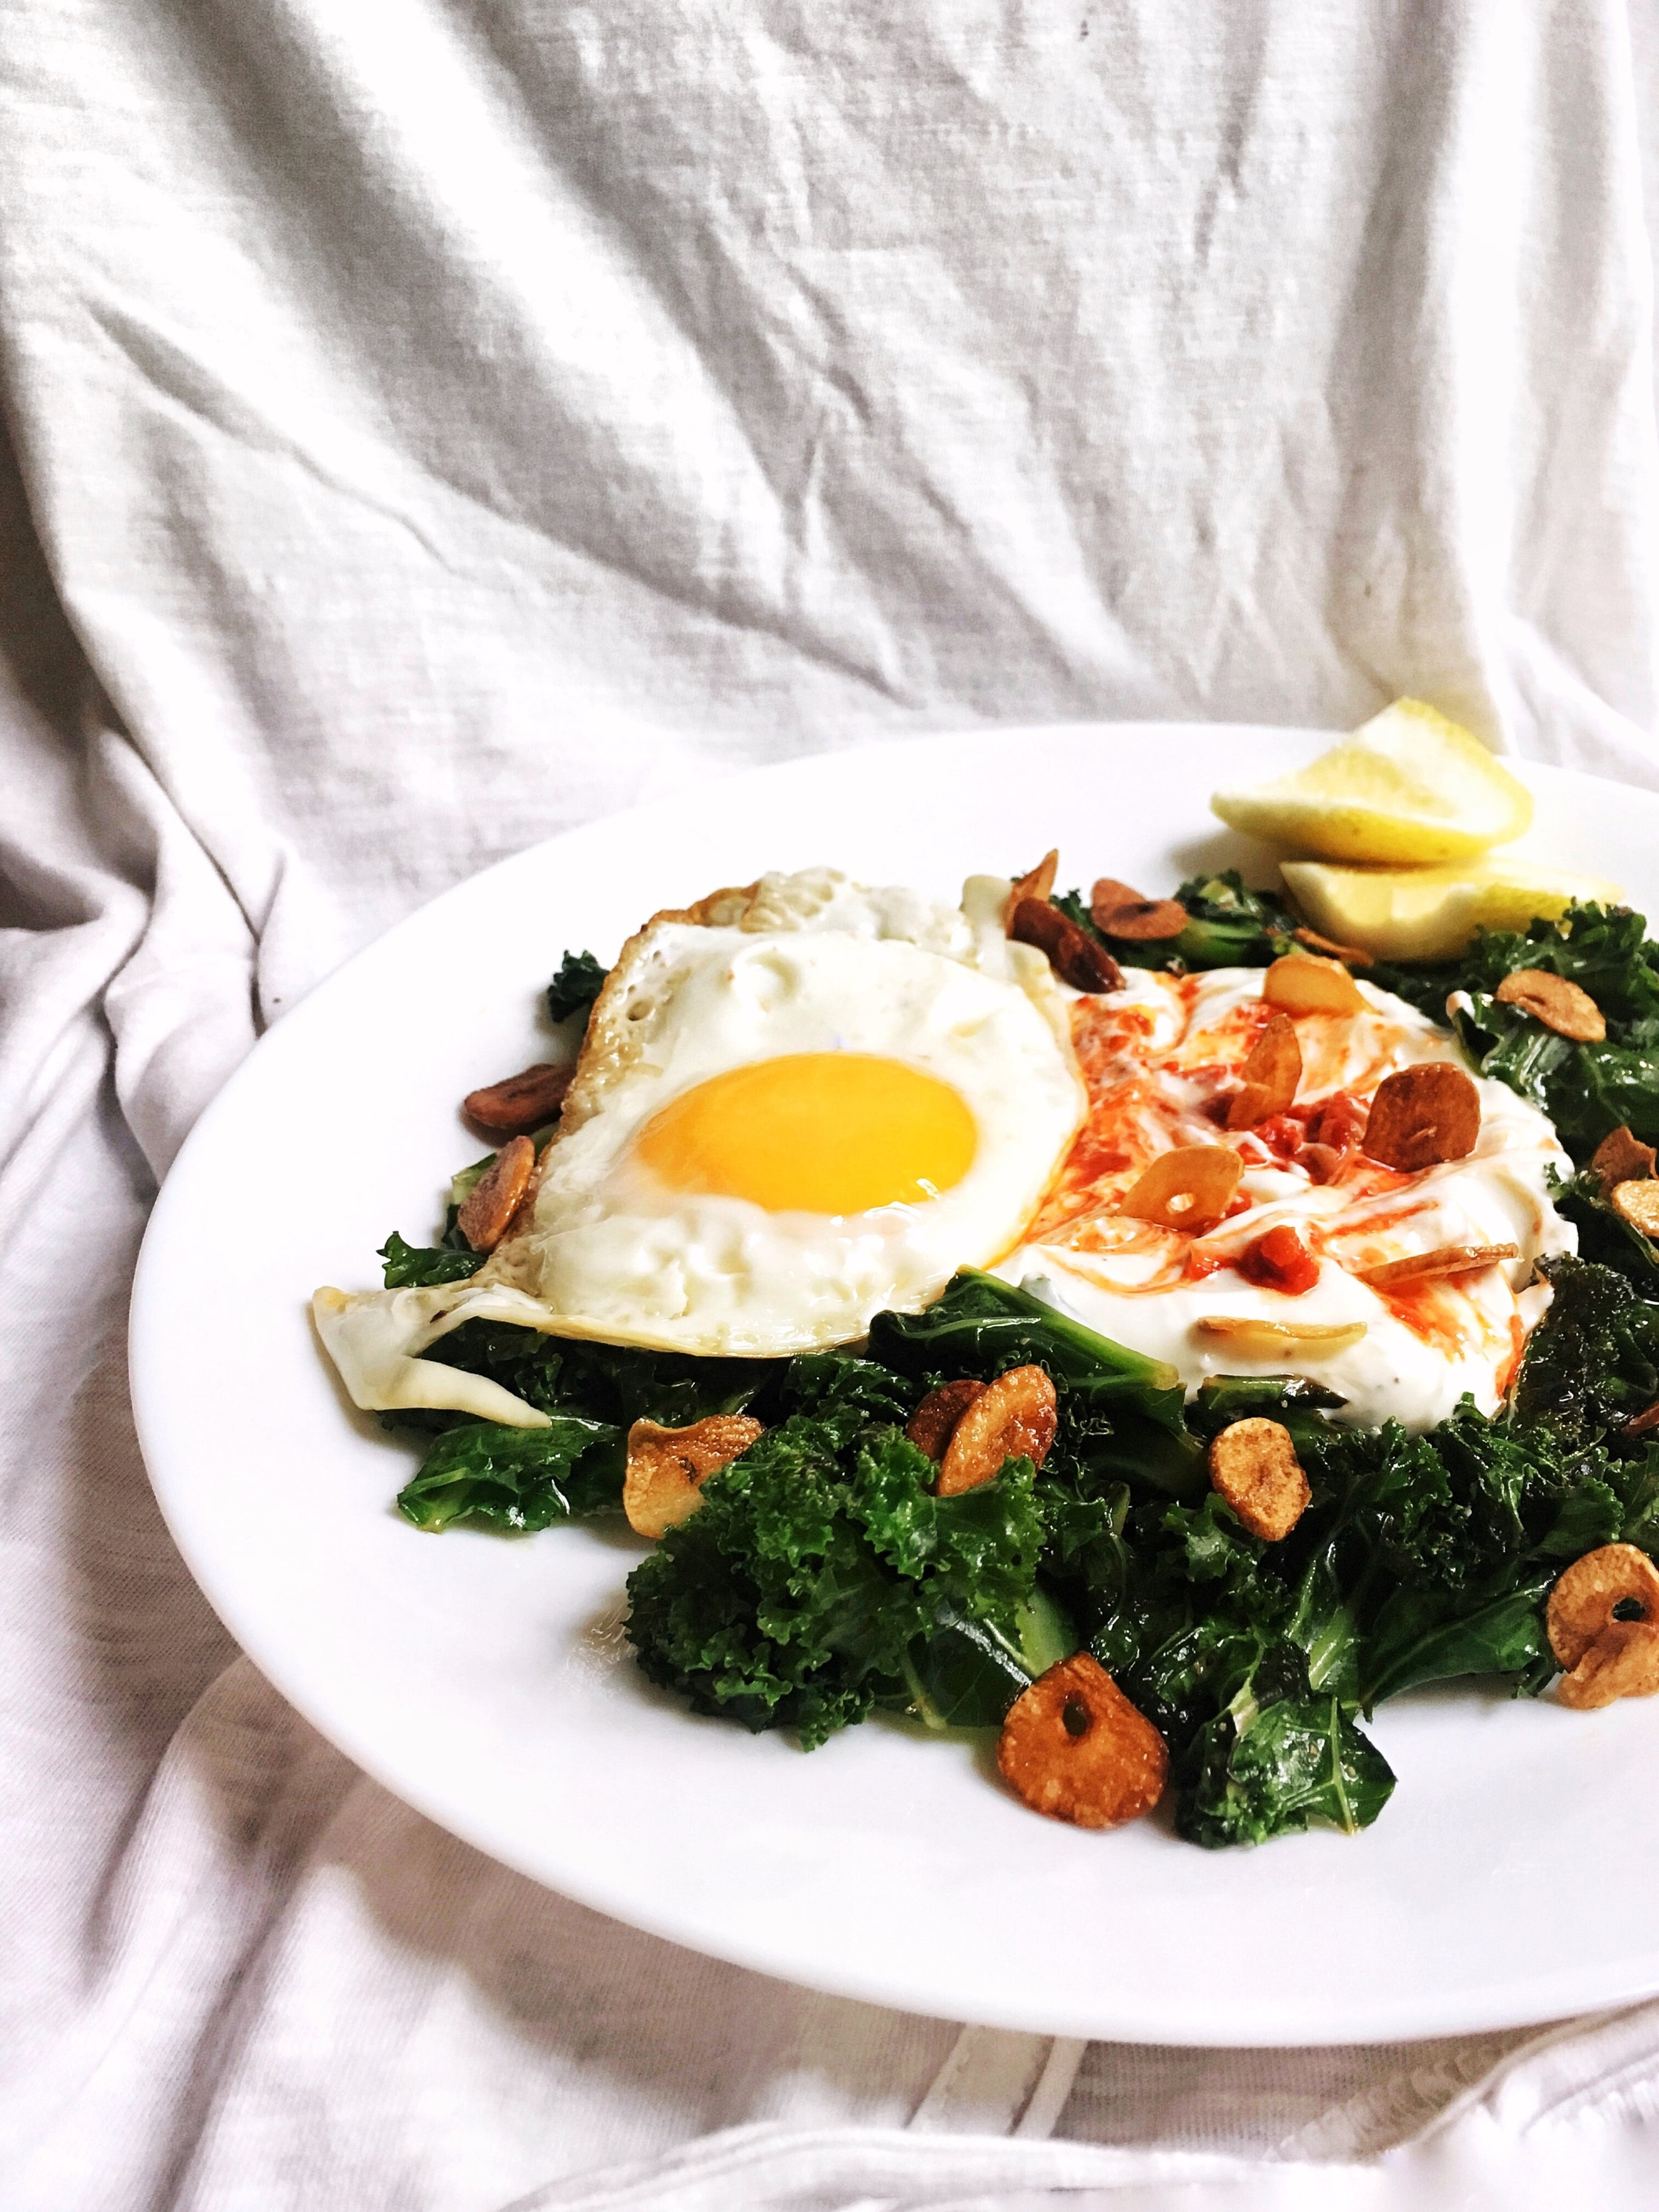 Wilted Kale with Fried Garlic & Spiced Harissa Yogurt - Brad & Butter | June 18, 2019